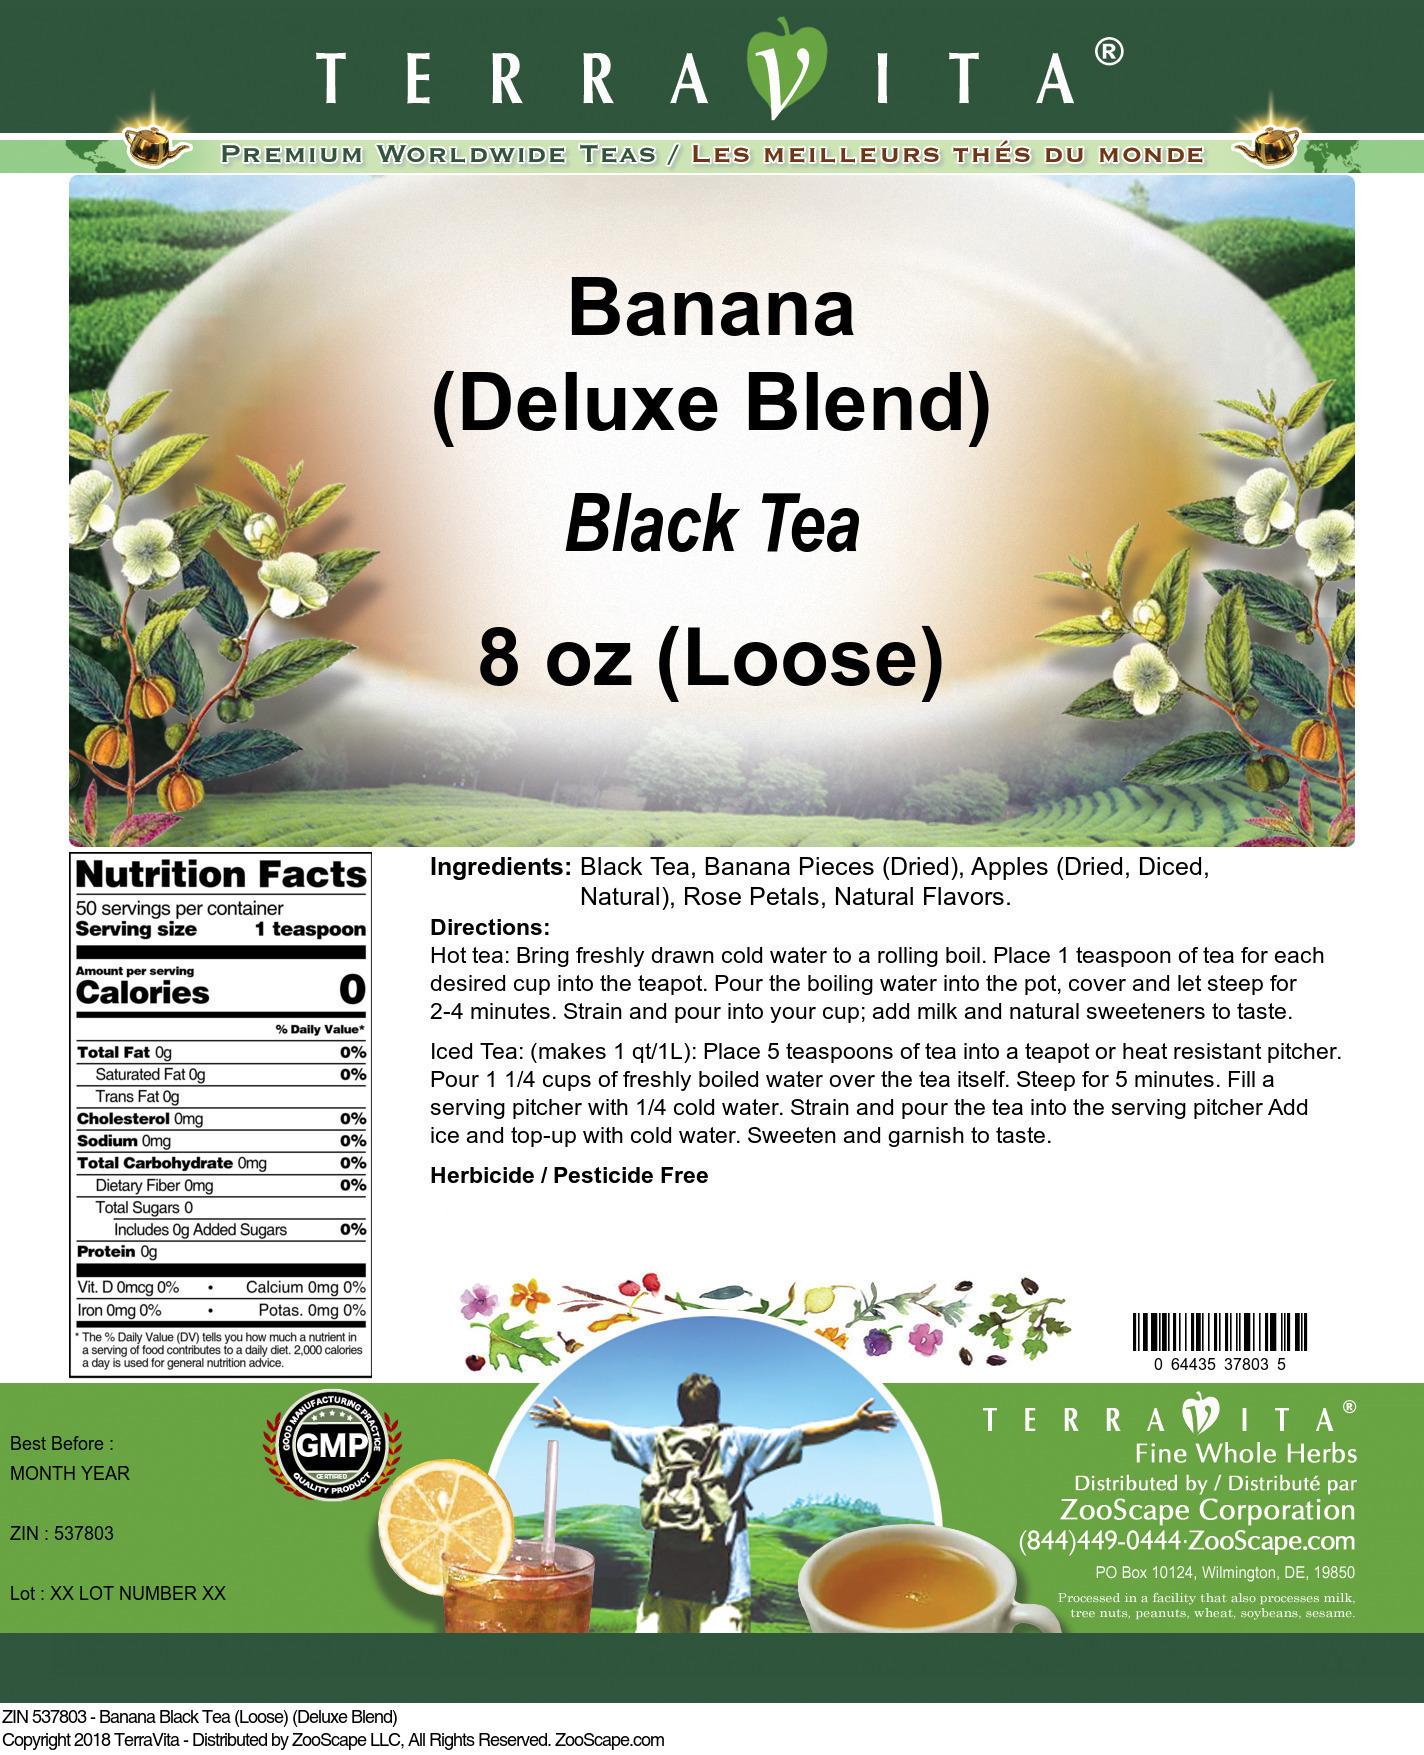 Banana Black Tea (Loose) (Deluxe Blend)